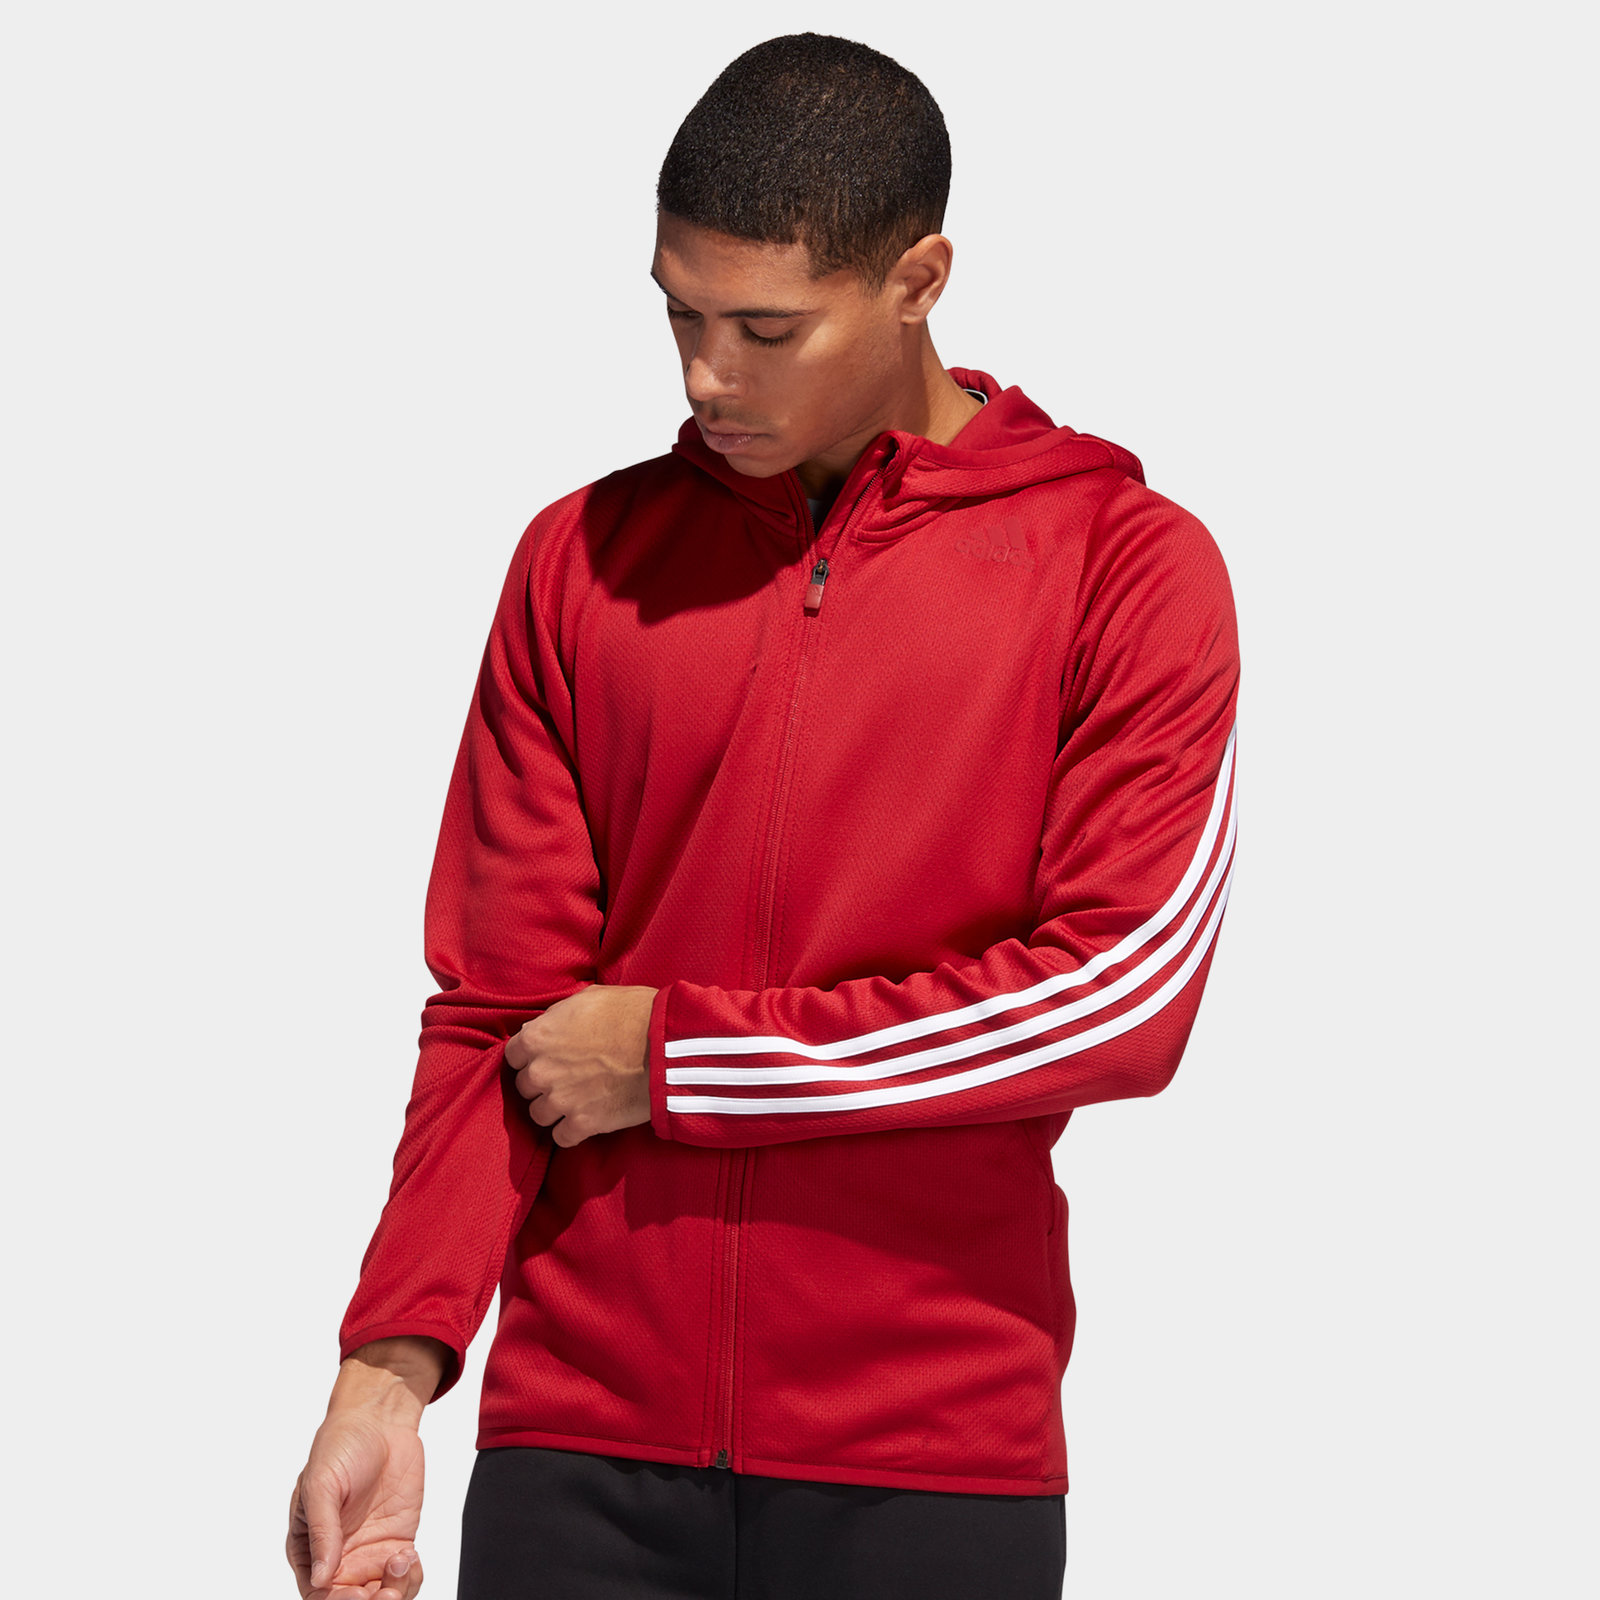 Image of 3 Stripes Full Zip Hooded Sweat